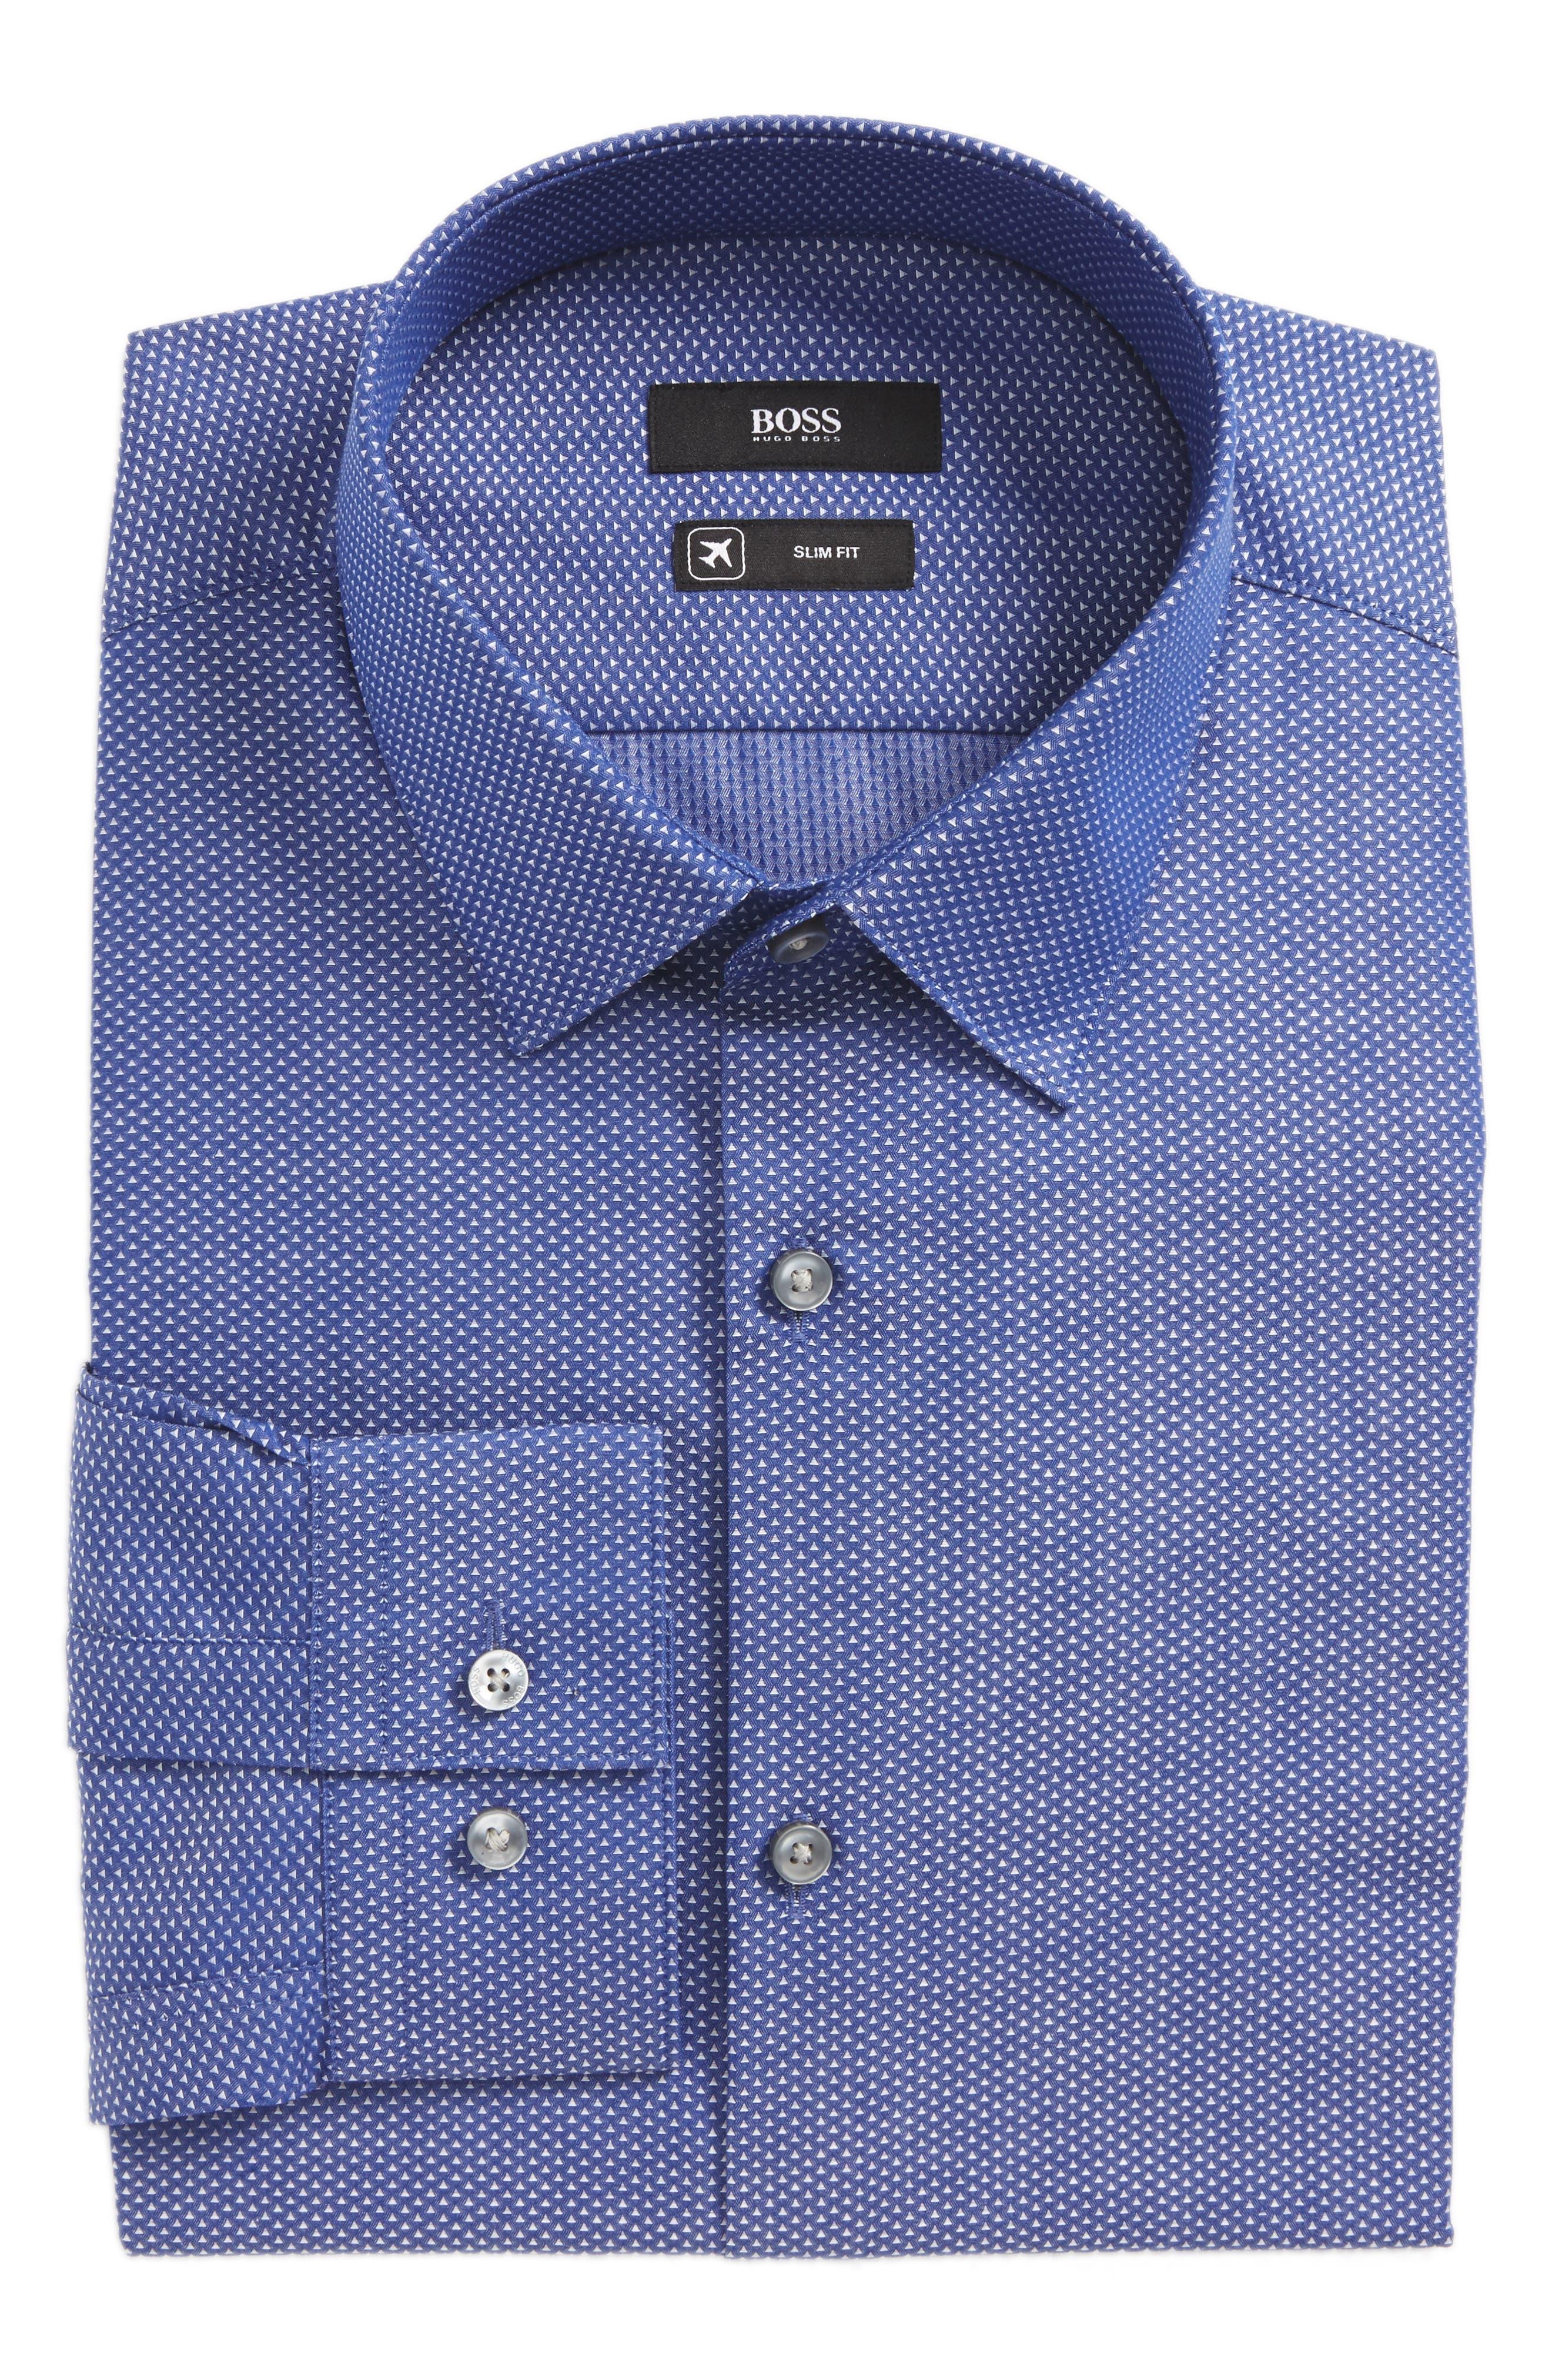 Isko Slim Fit Geometric Dress Shirt,                         Main,                         color,